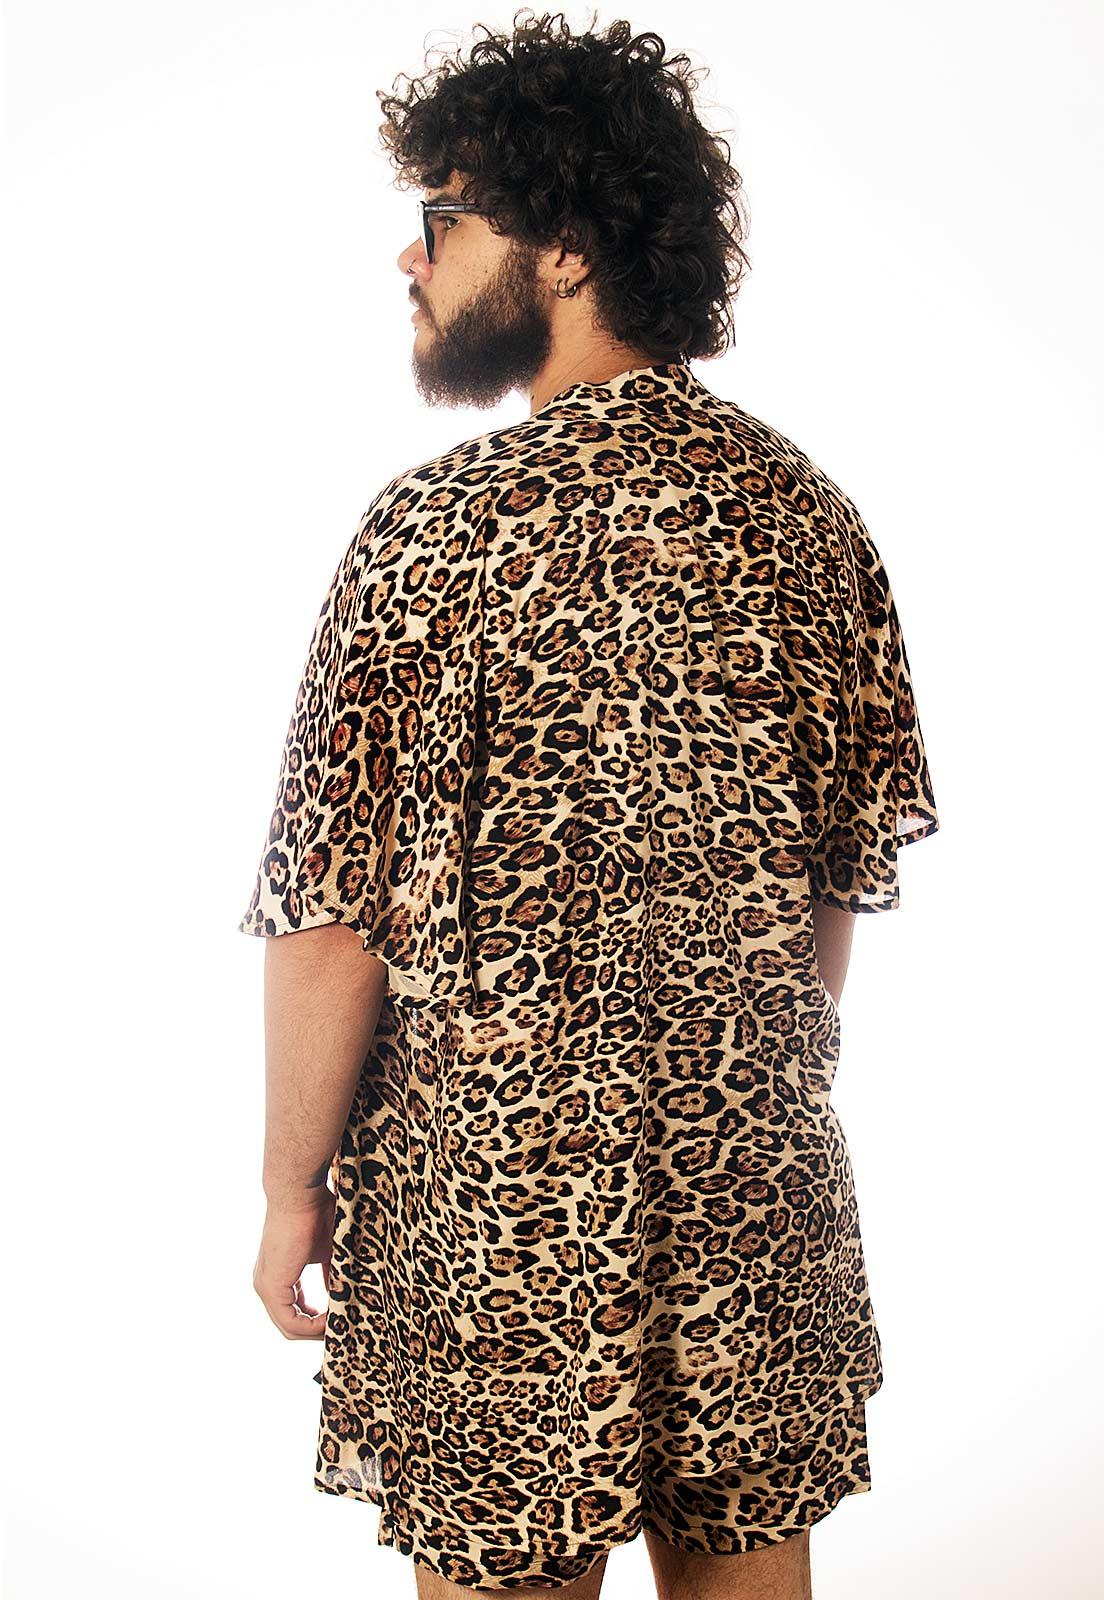 Cardigan Kimono Oncinha Estampado ElephunK Animal Print Feminino Masculino Moda Marrom